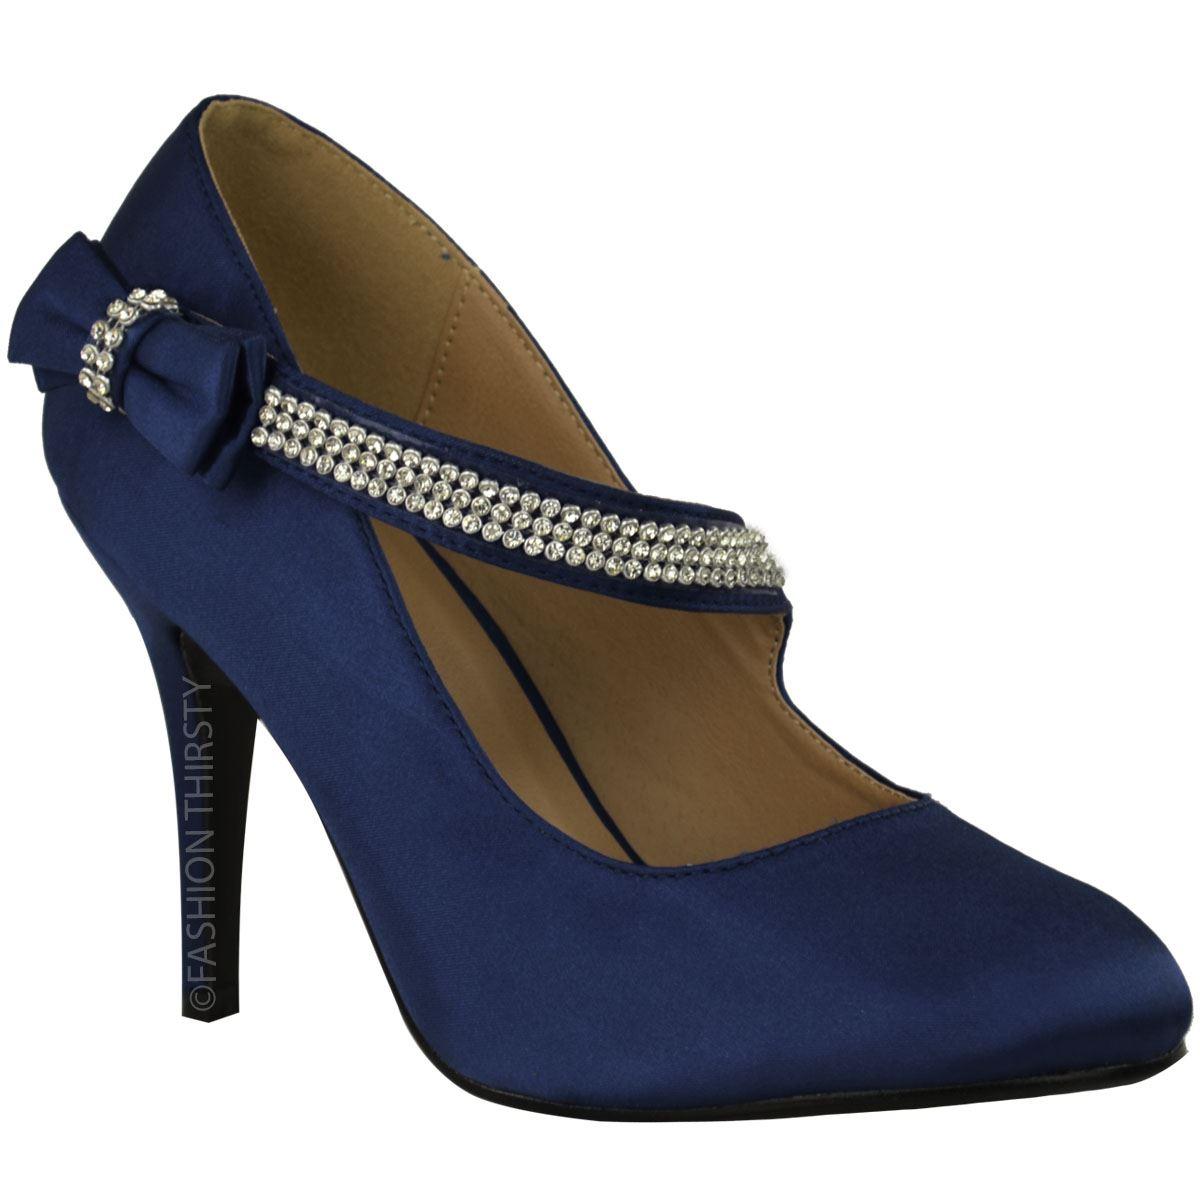 GeeksHive: The Highest Heel Highest Heel Womens 4 Plain